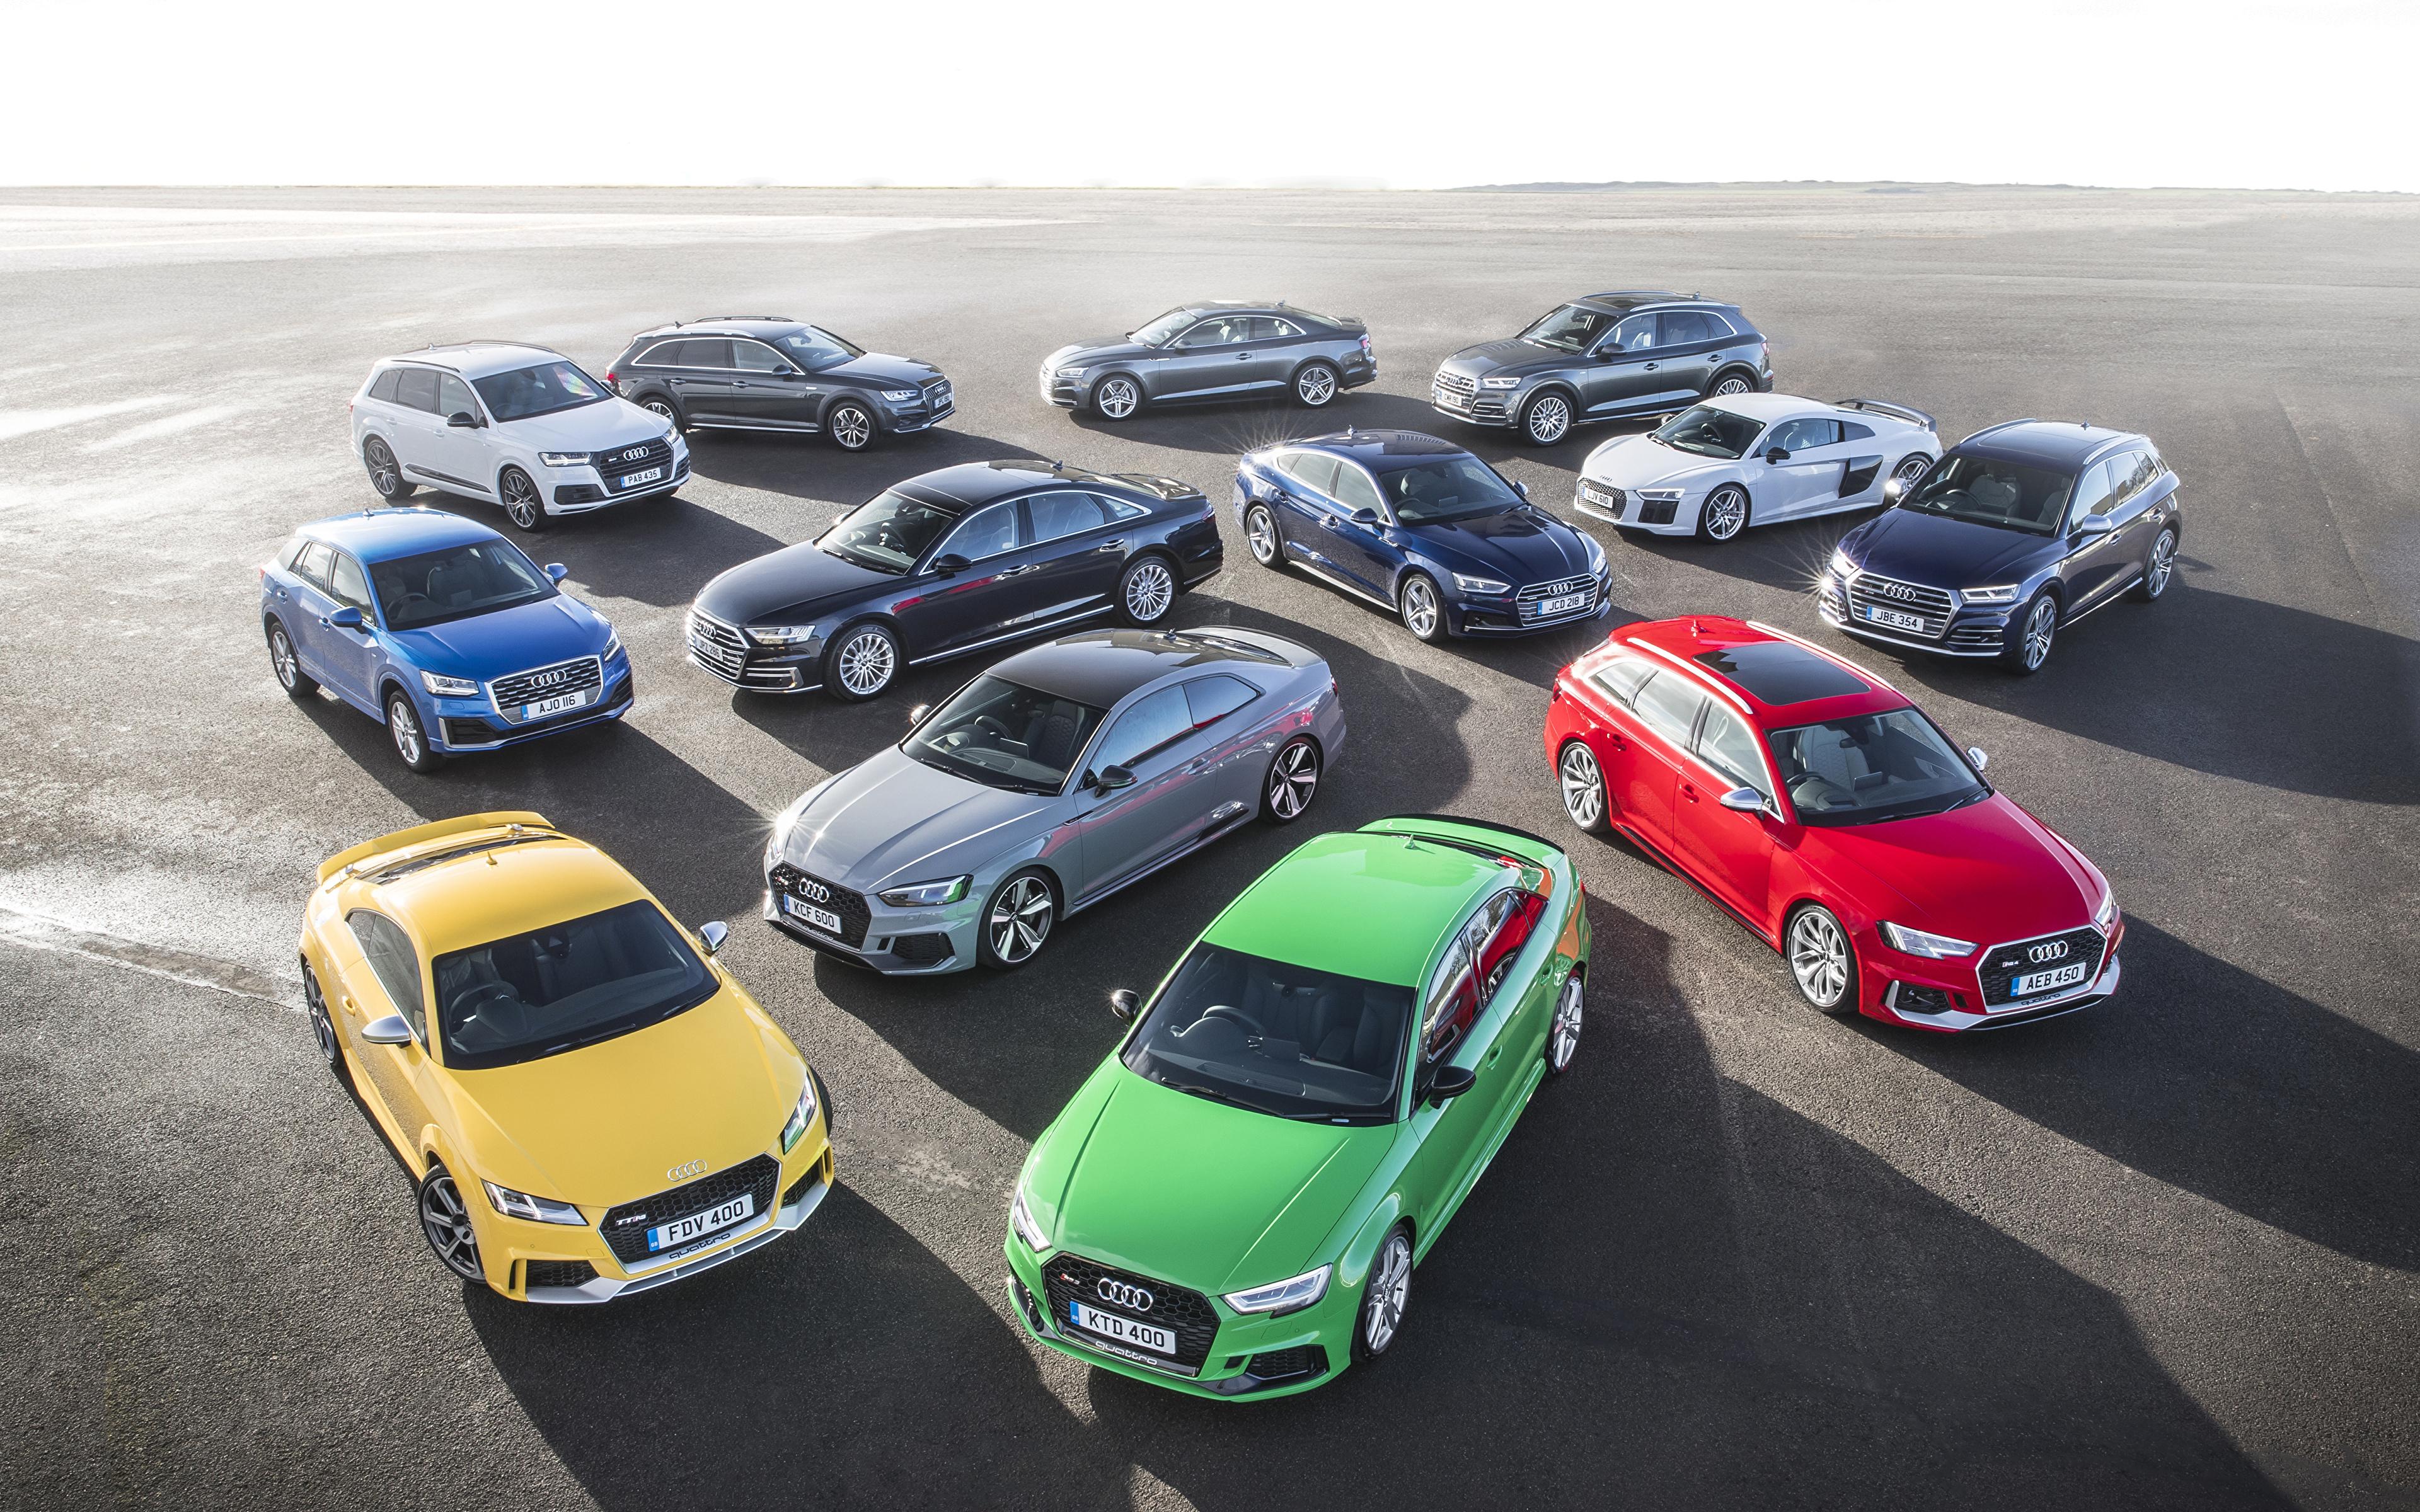 Audi Dealers Near Me >> Wallpaper Audi Cars Many 3840x2400